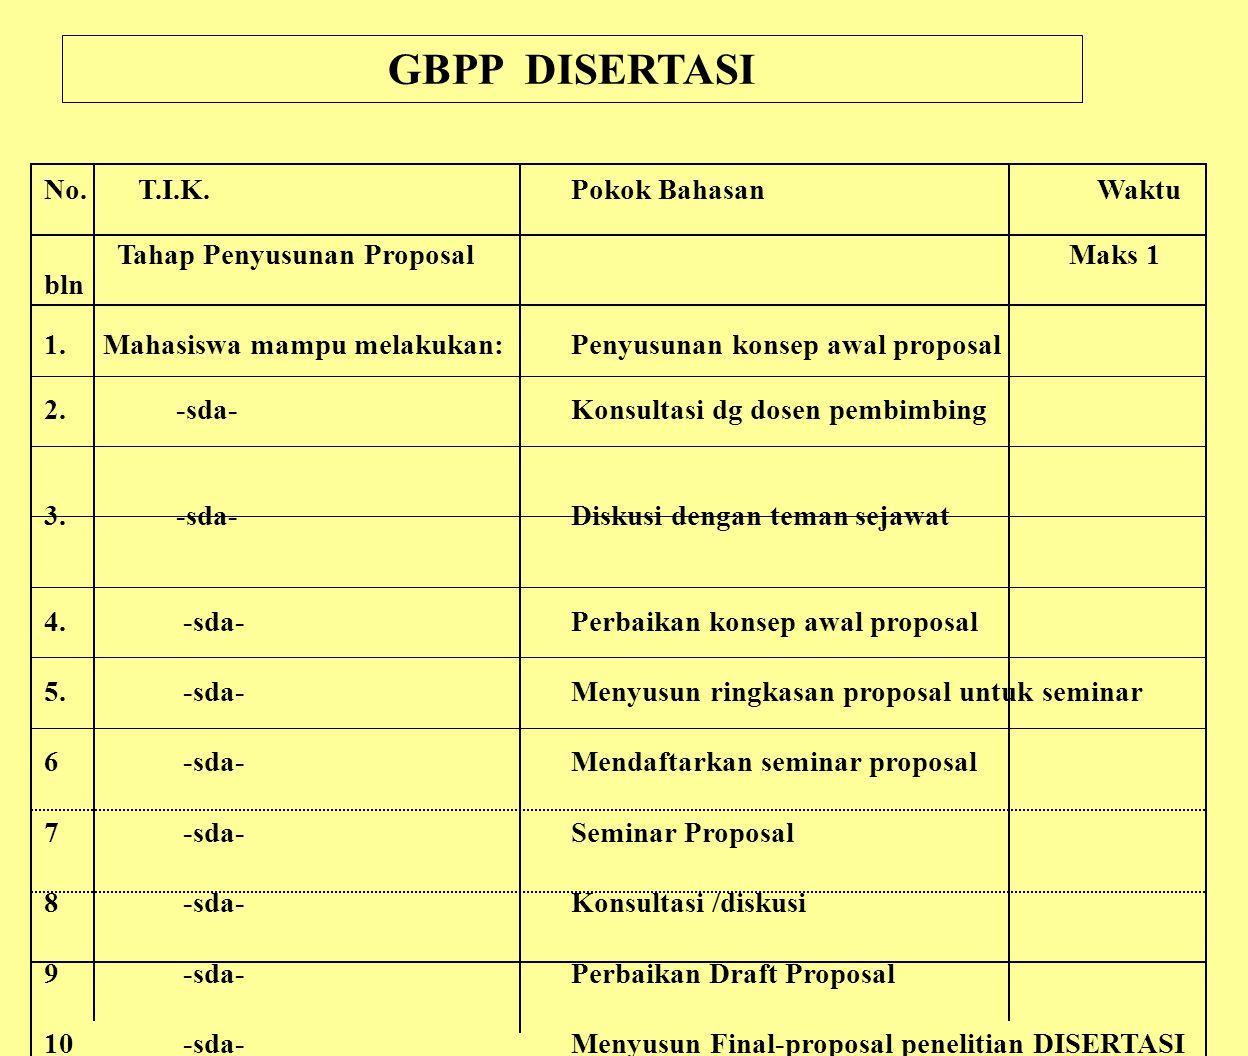 GBPP DISERTASI No. T.I.K. Pokok Bahasan Waktu Tahap Penyusunan Proposal Maks 1 bln 1. Mahasiswa mampu melakukan:Penyusunan konsep awal proposal 2.-sda